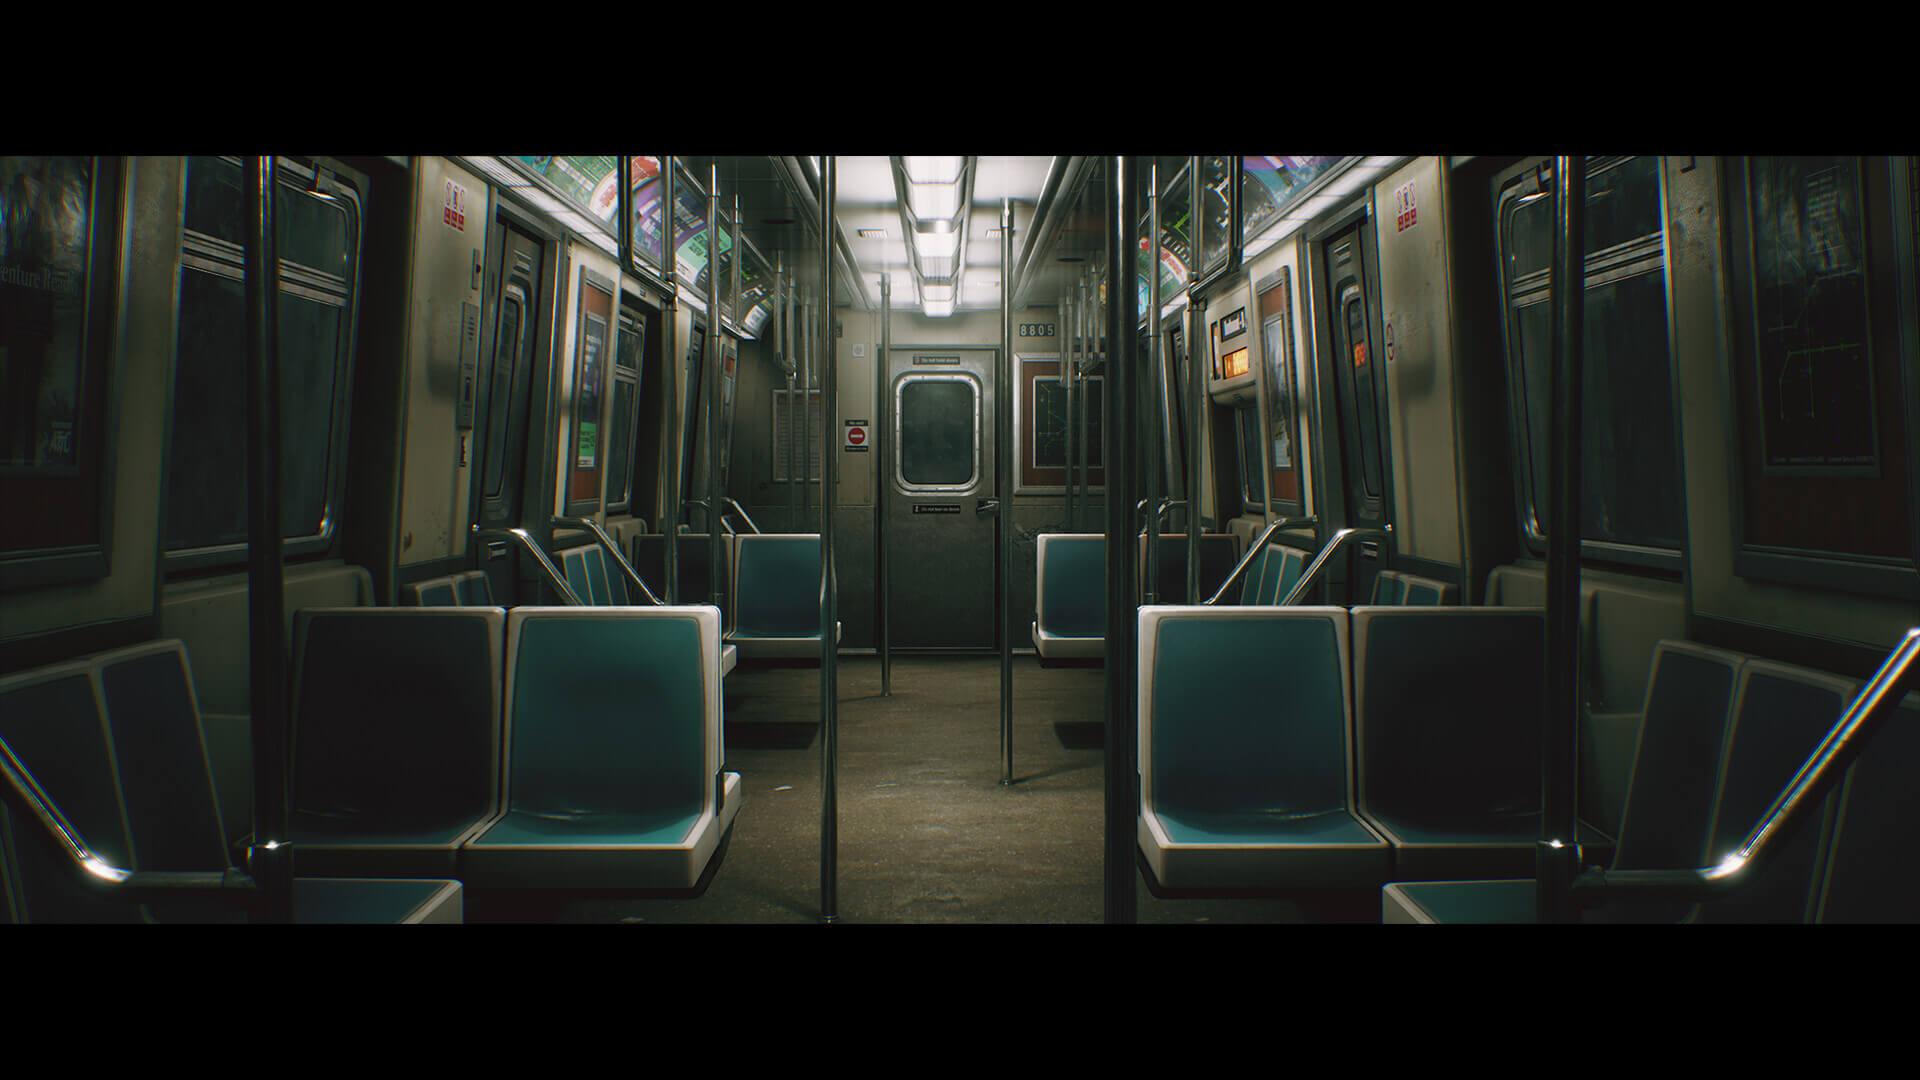 dekogon studios subwaytrain screenshot 02 - 【画像】『PS5』世代のゲームはこんな感じのグラフィックになるらしい